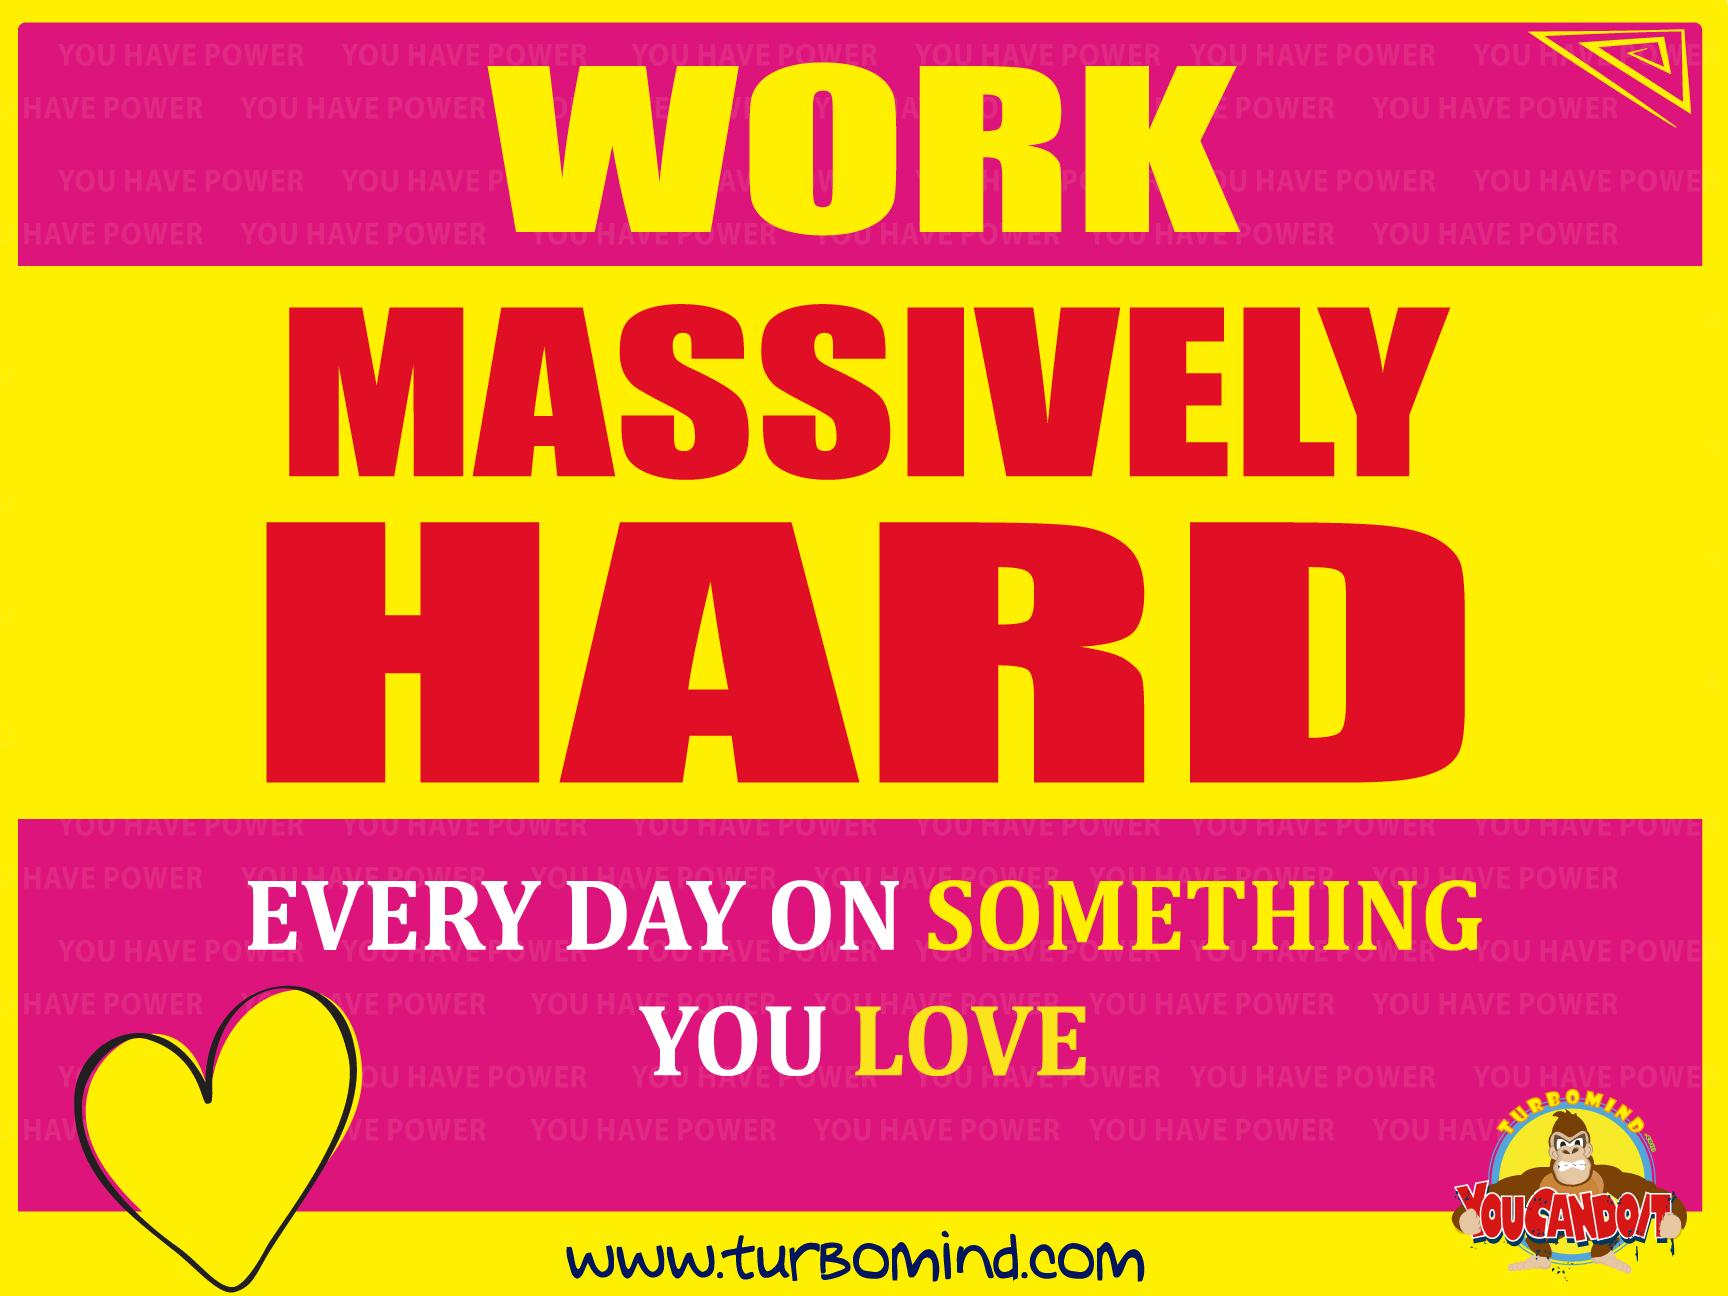 WORK MASSIVELY HARD on something you love.